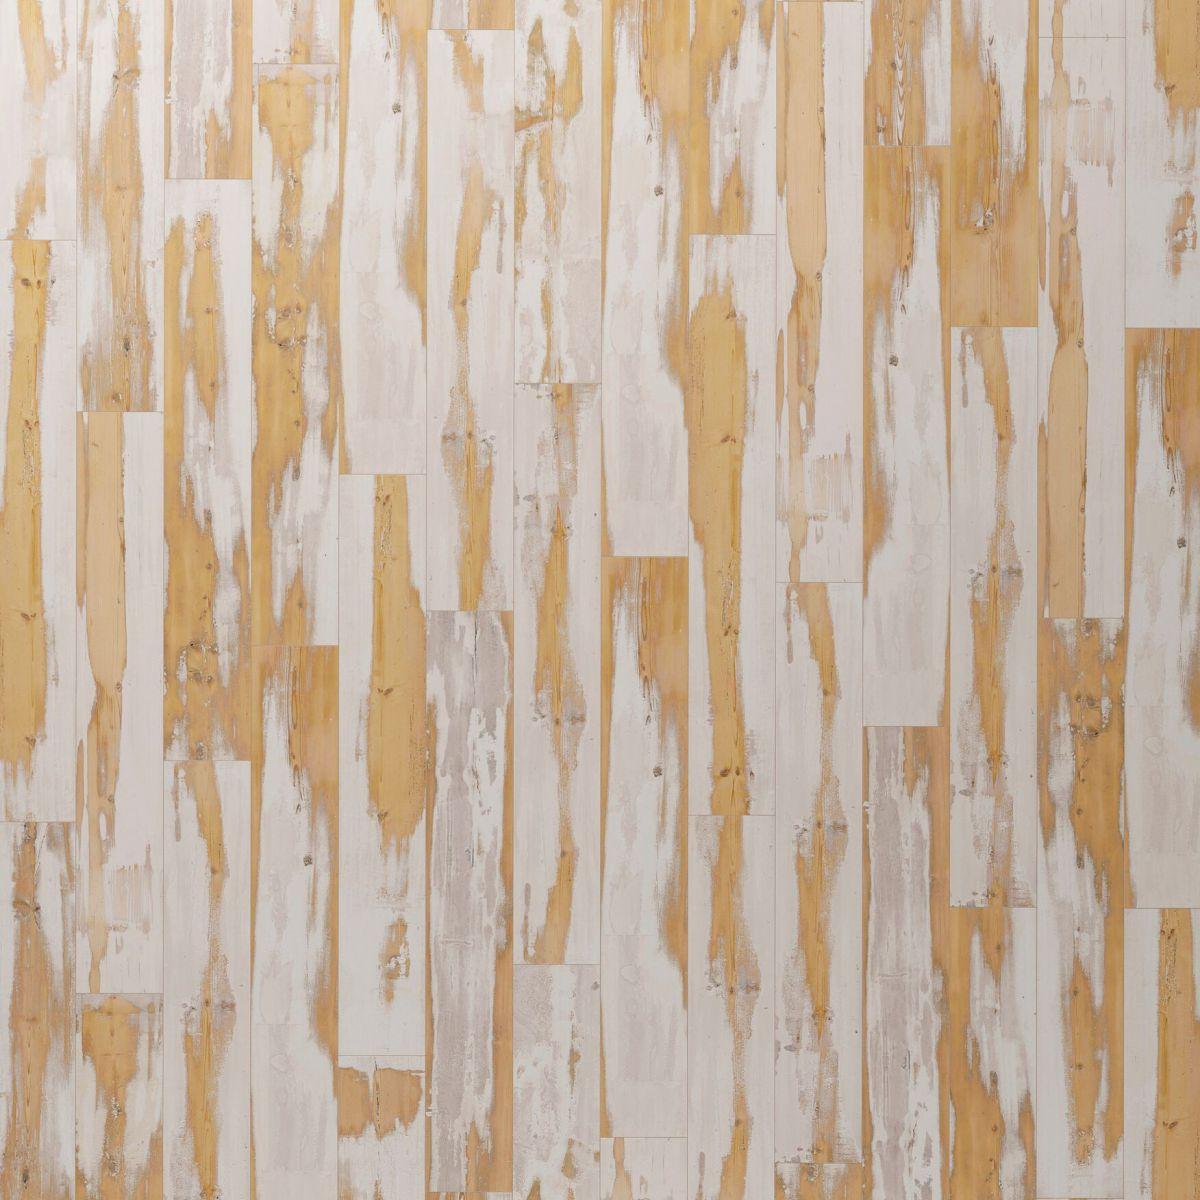 Avatara vloerdelen hout K06 plan